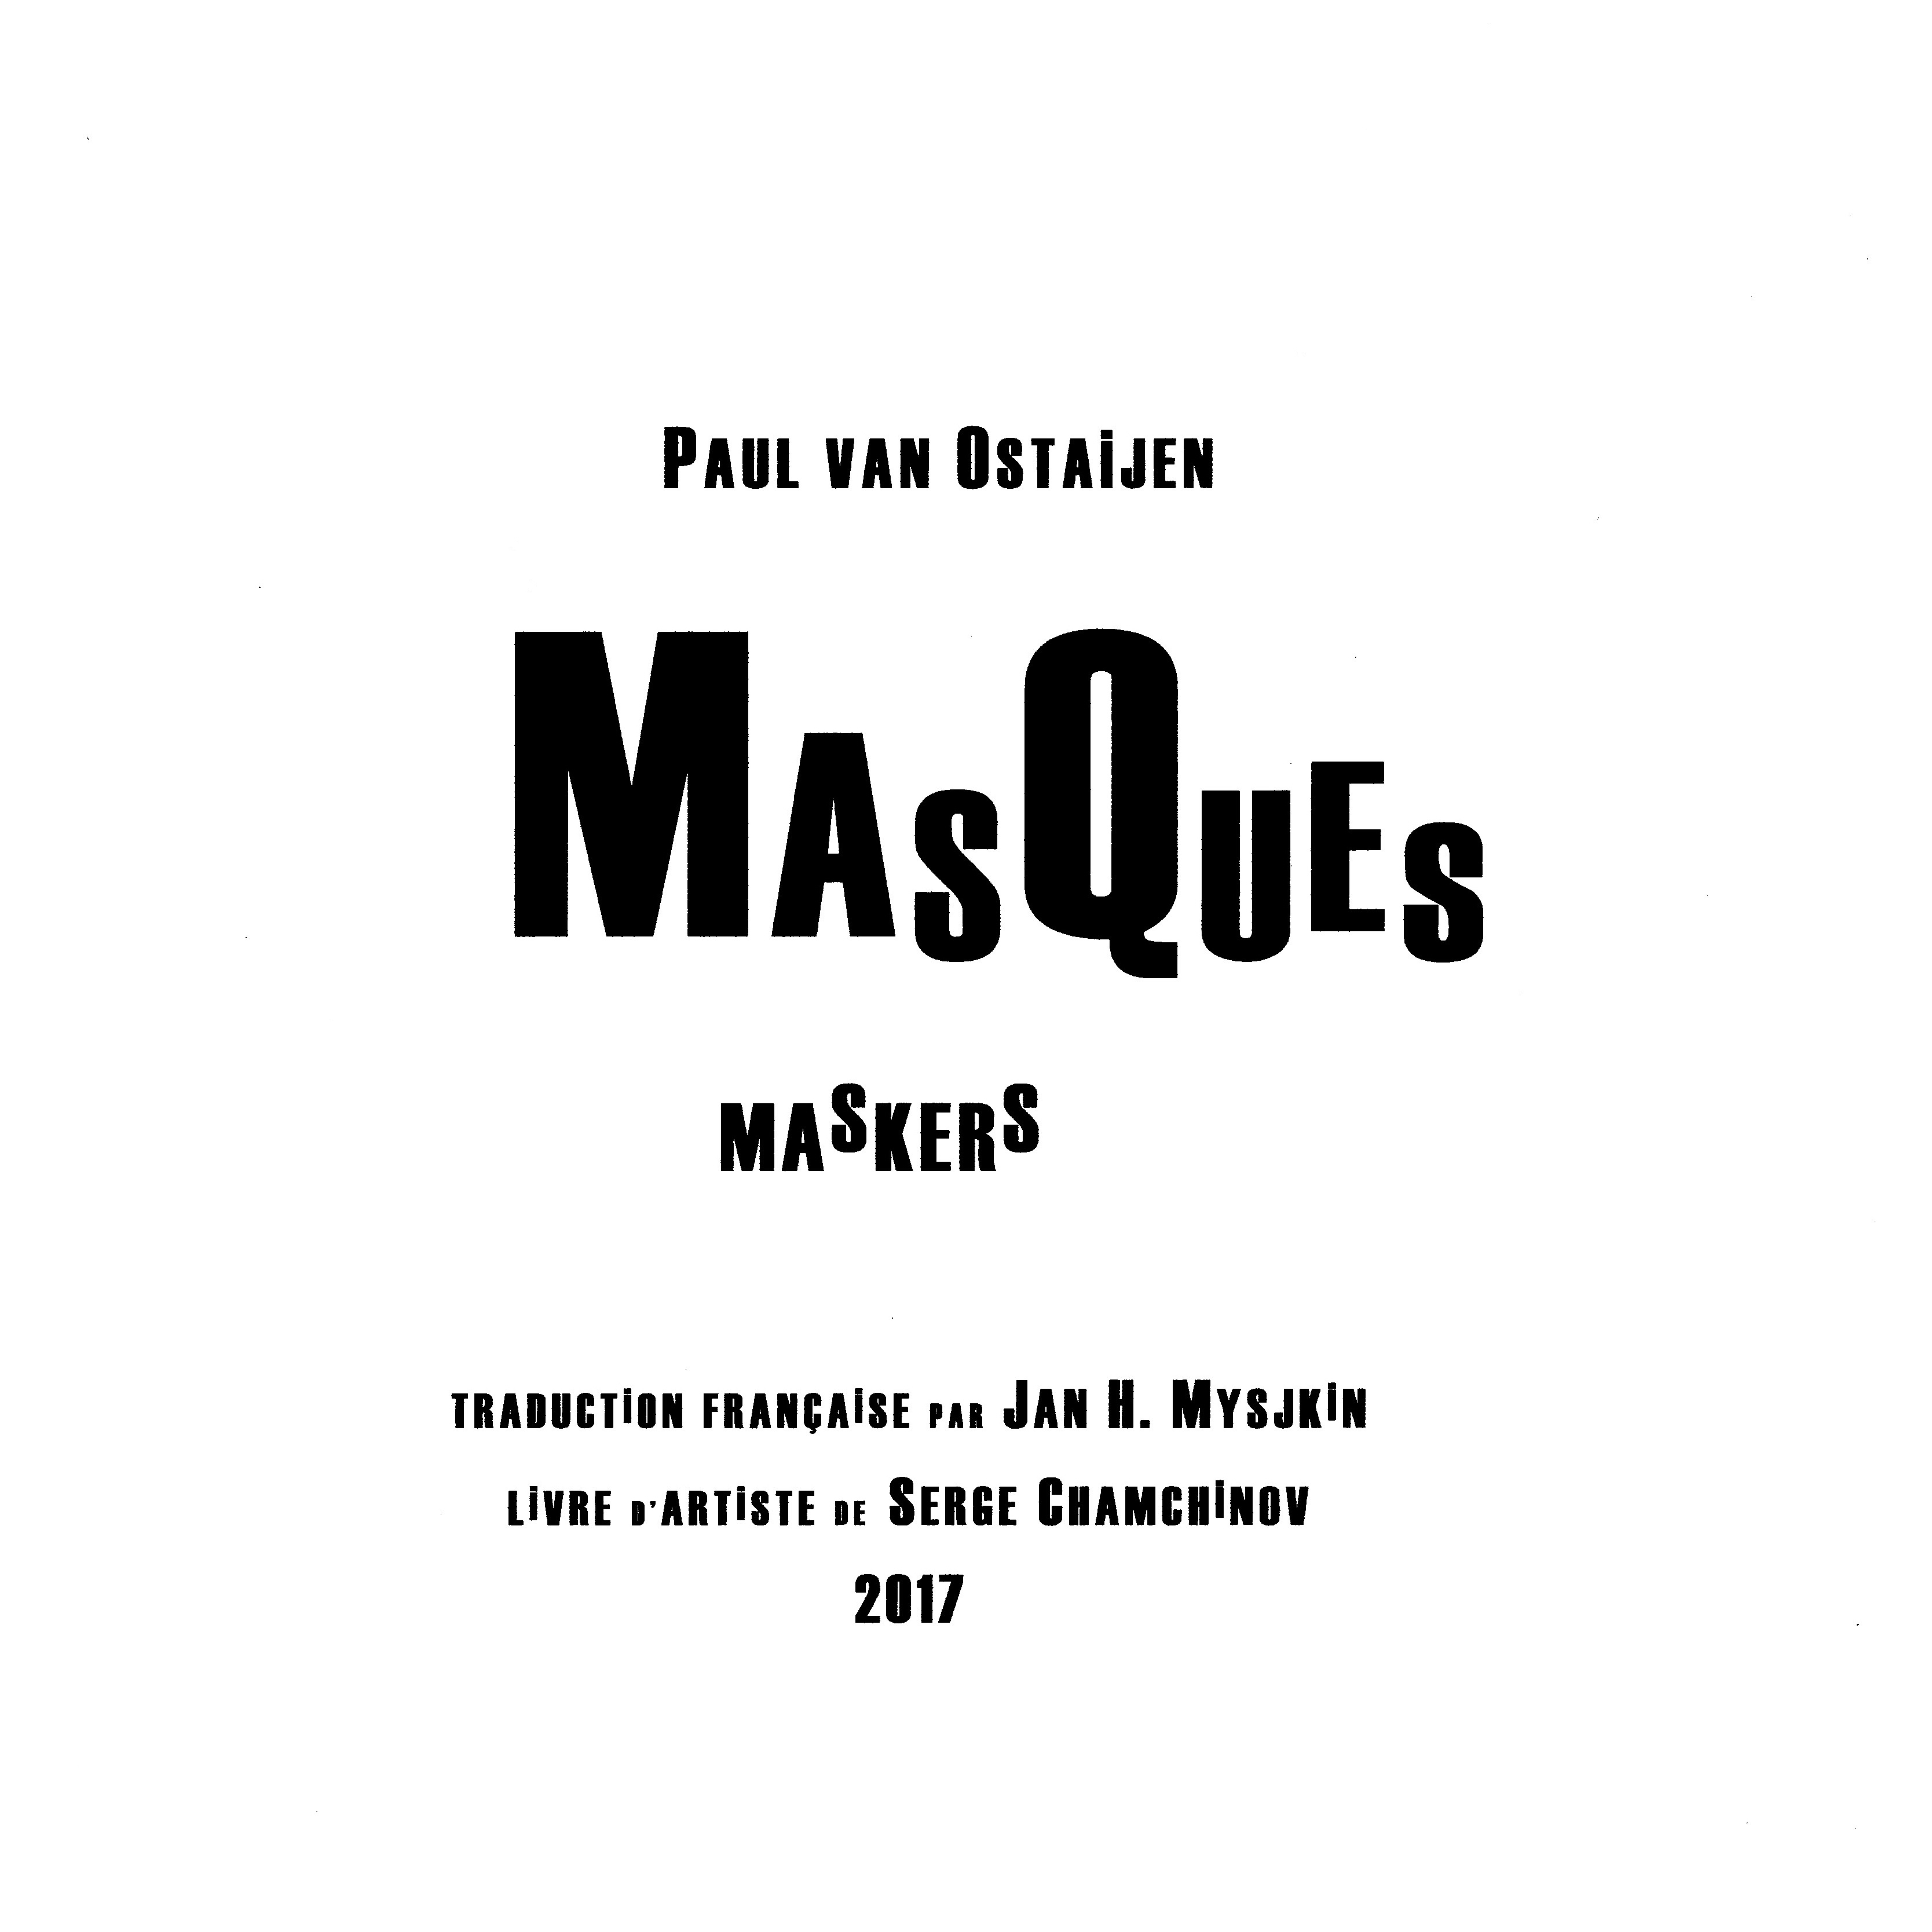 Paul van Ostaijen, Masques (Maskers, 1918-1921)